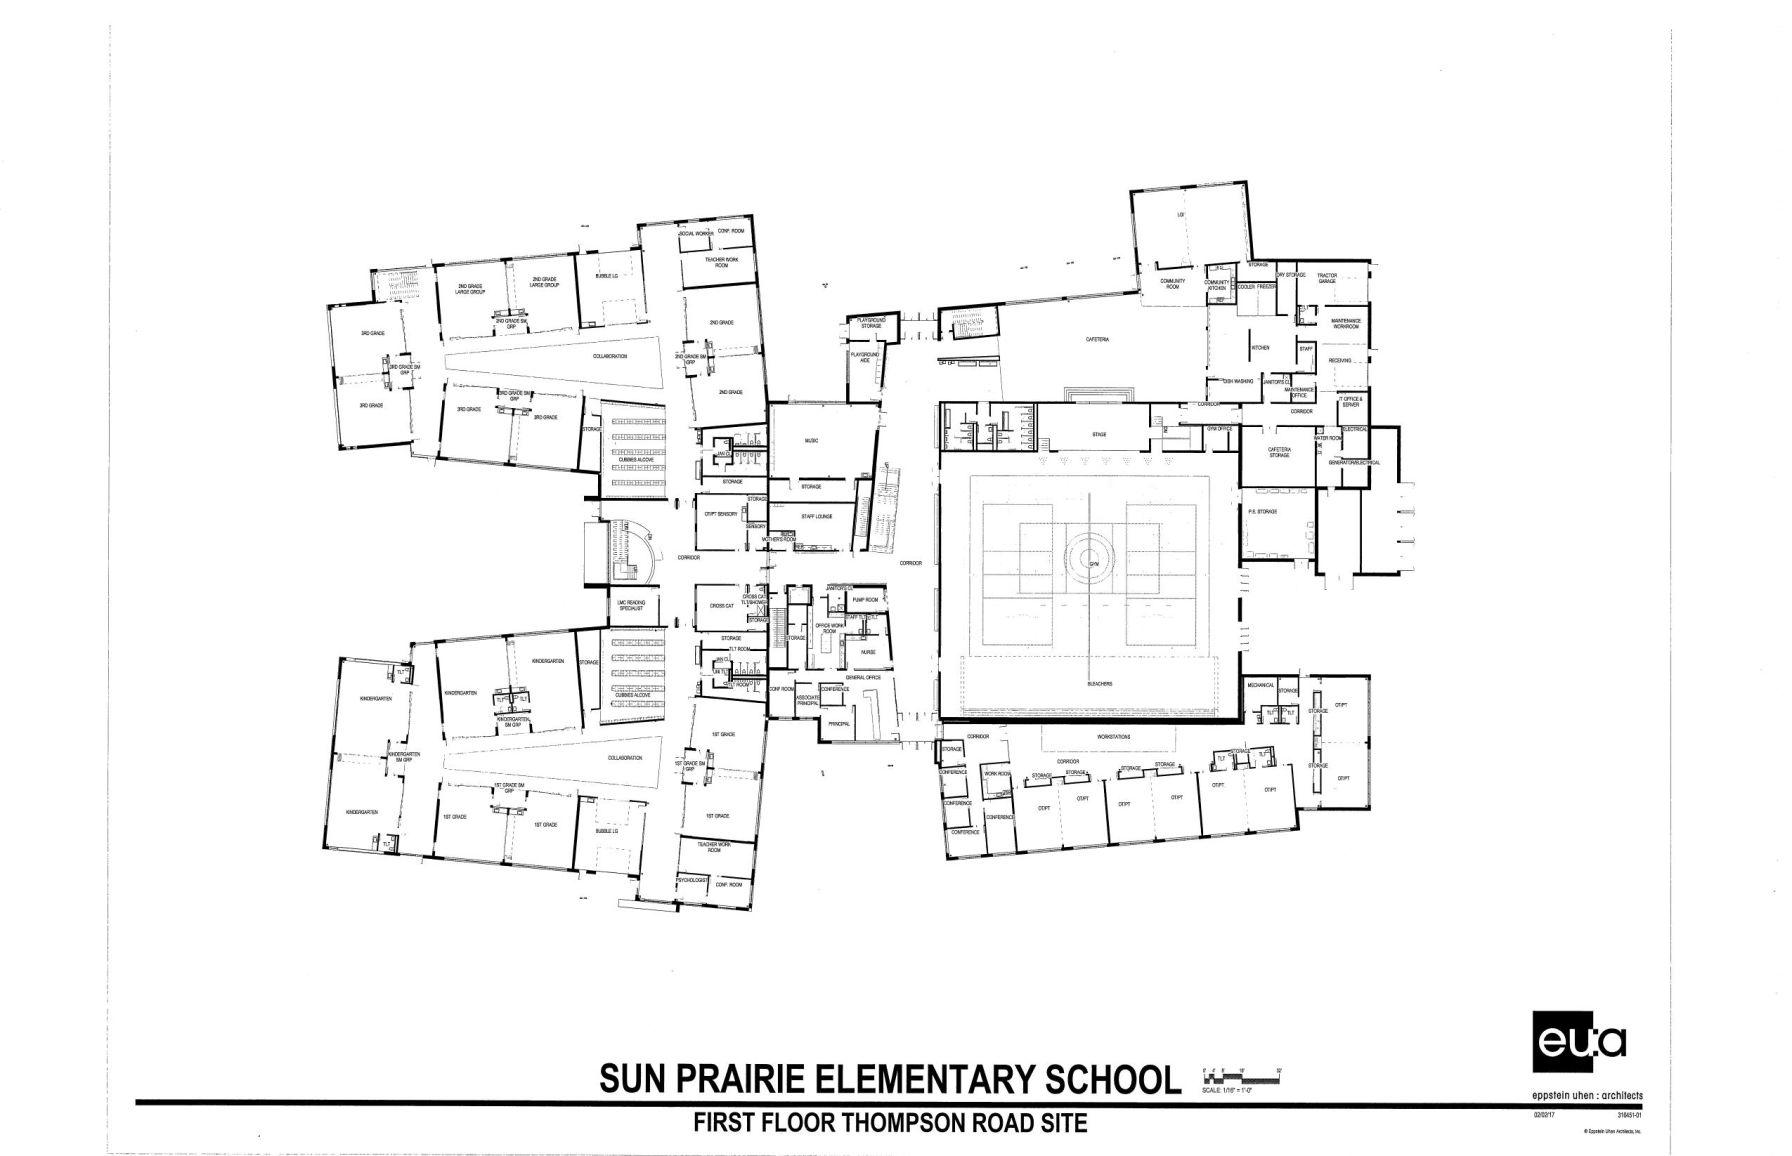 Thompson Road Preliminary Floor Plan 2 6 17 Pdf School Hngnews Com